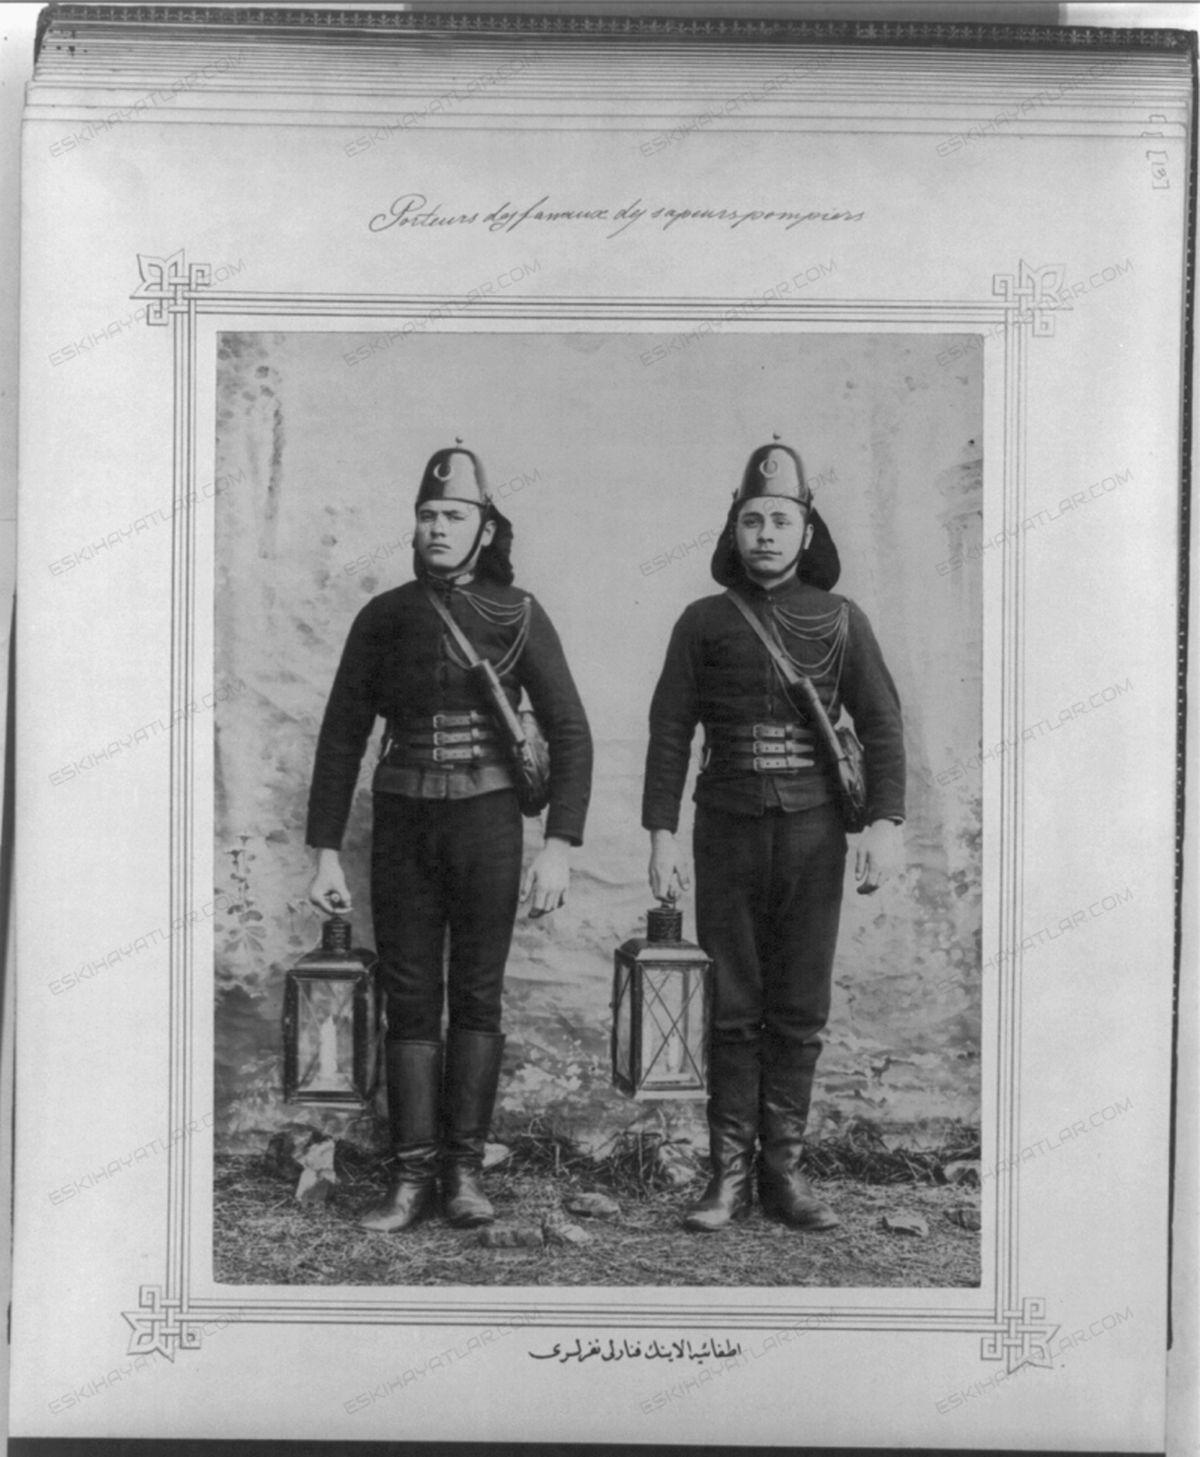 0369-sultan-abdulhamid-vefatinin-100-yili-yedi-kita-dergisi-abdulhamid-belgeseli (39)